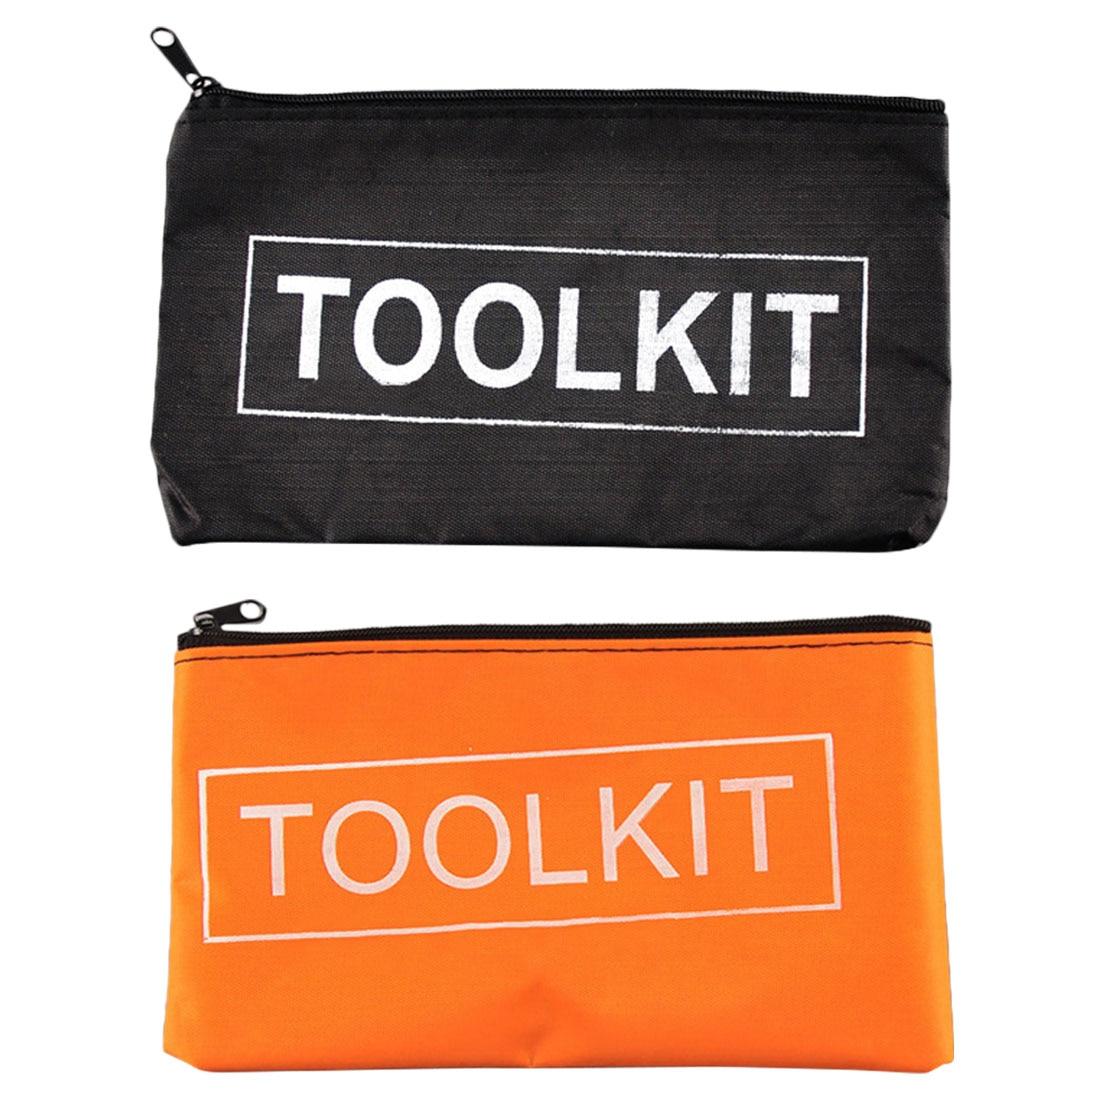 Mini Tool Kit Bag 600D Oxford Cloth Tool Bag Storage Instrument Case 19x11cm Universal Size Convenient Hand Tool Bag Pocket